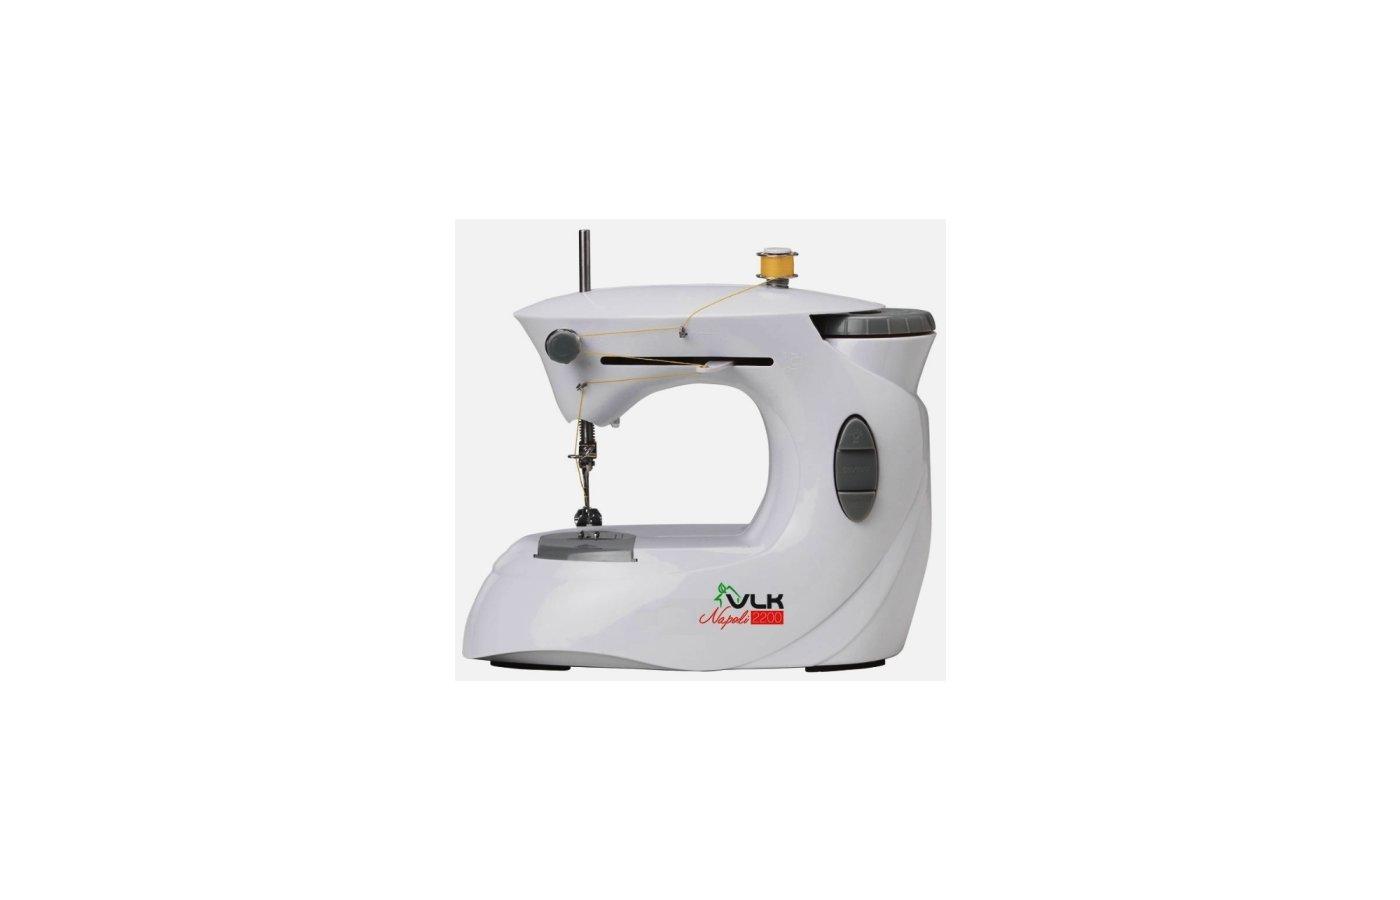 Швейная машина VLK Napoli 2200